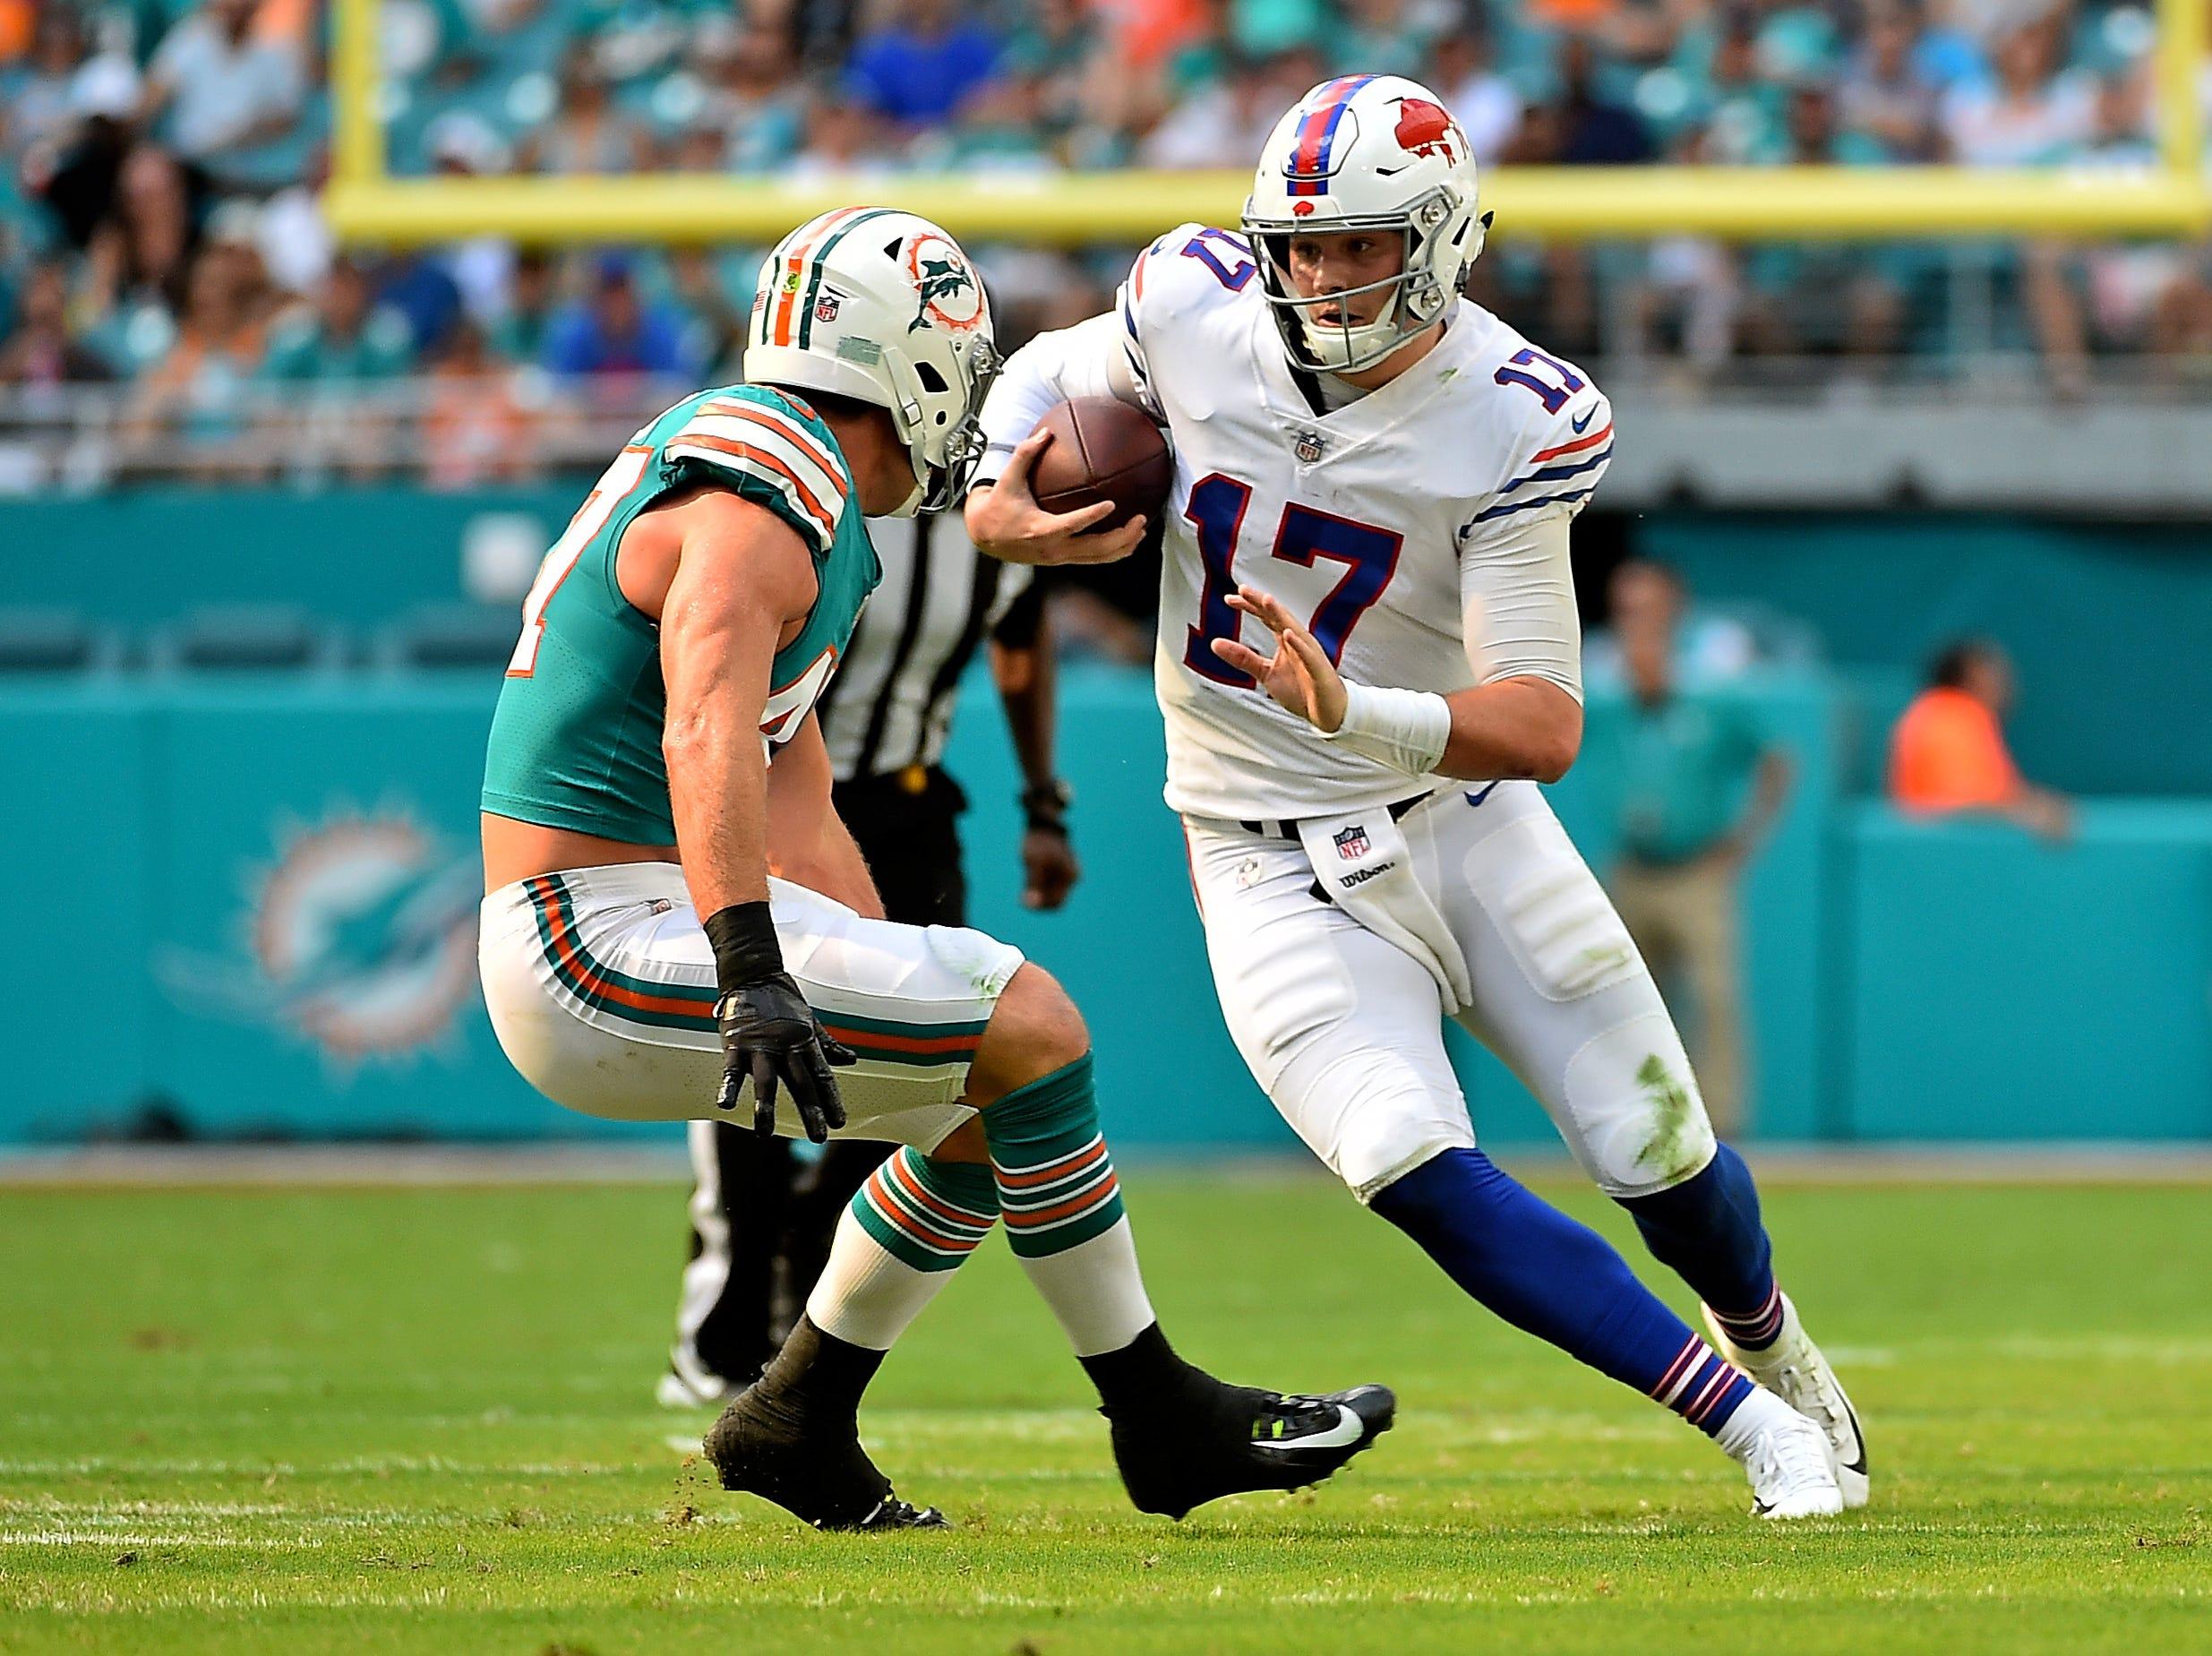 Dec 2, 2018; Miami Gardens, FL, USA; Buffalo Bills quarterback Josh Allen (17) scrambles around Miami Dolphins outside linebacker Kiko Alonso (47) during the first half at Hard Rock Stadium. Mandatory Credit: Jasen Vinlove-USA TODAY Sports